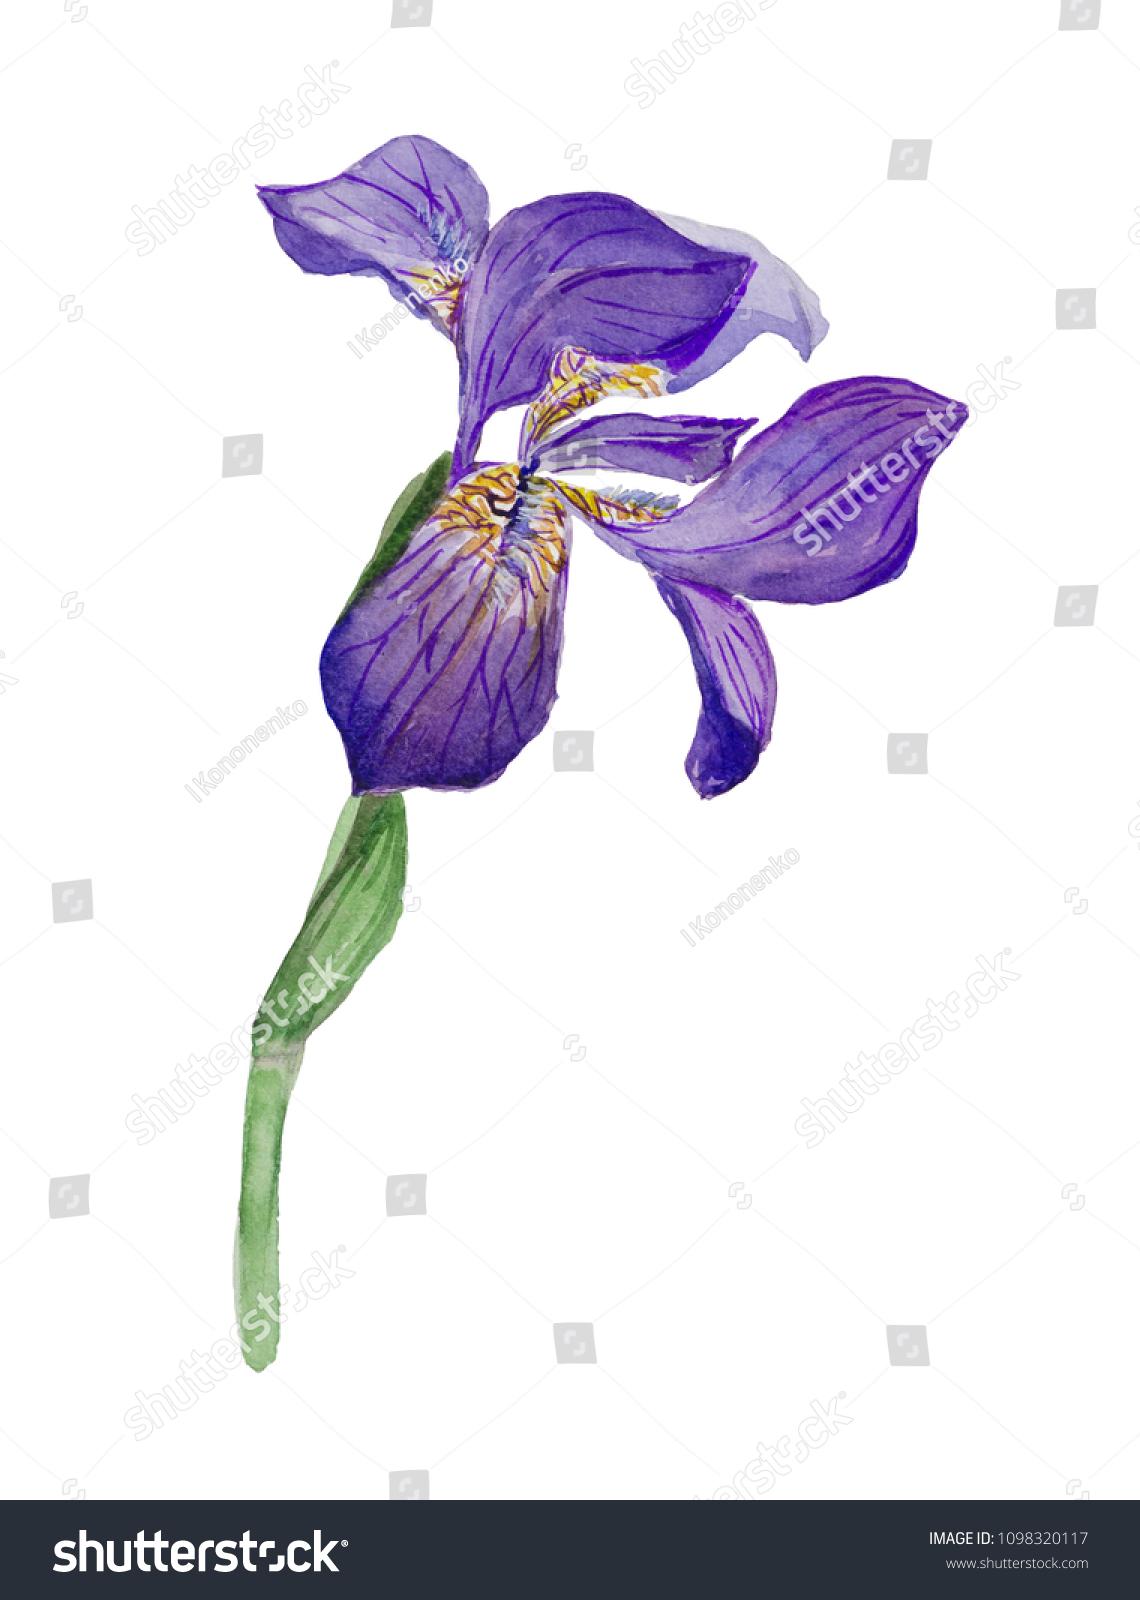 Blue iris flower isolated on white backgrounds ez canvas izmirmasajfo